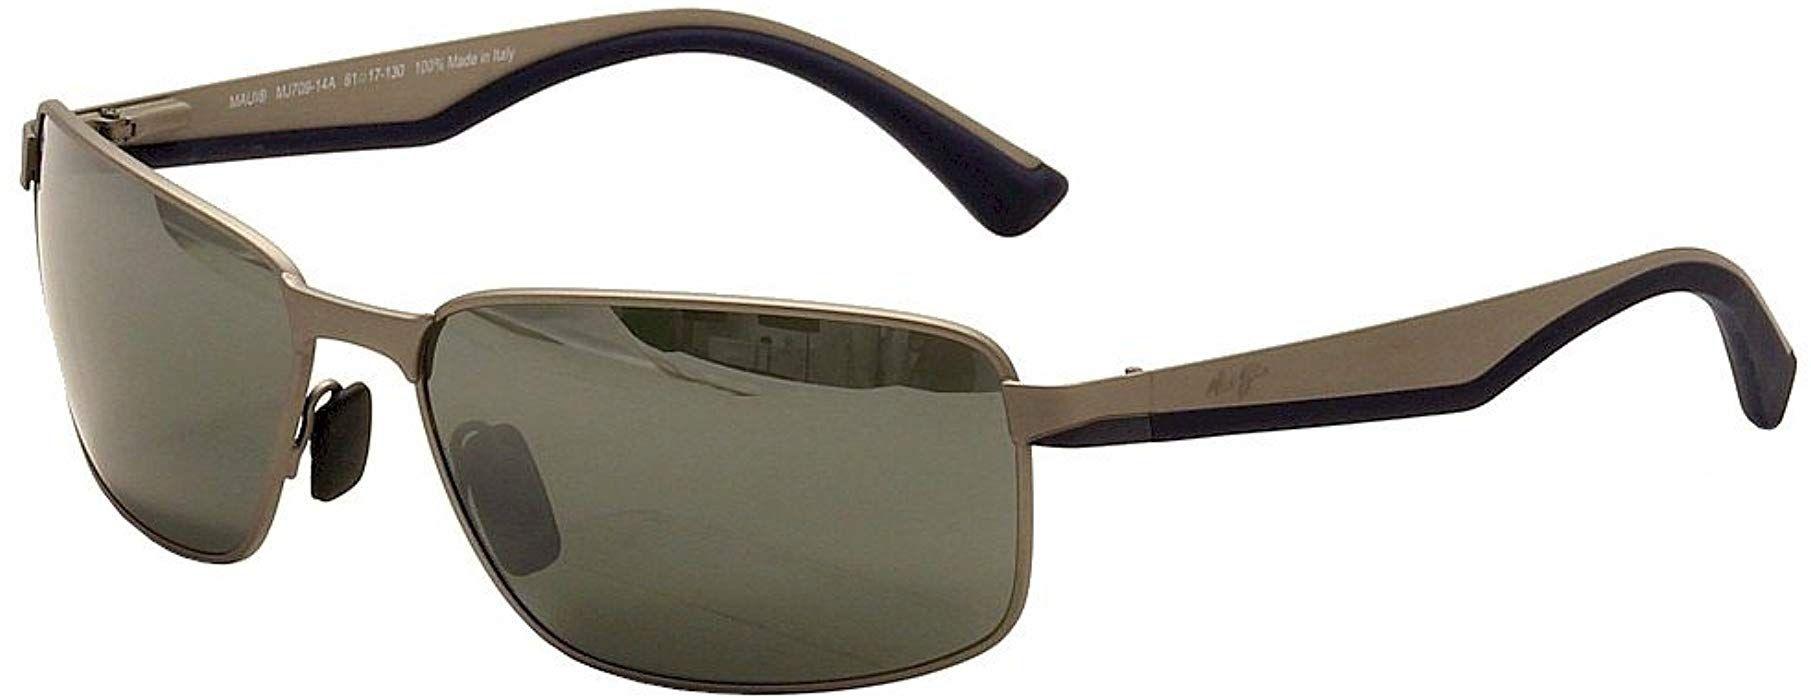 Maui jim backswing polarized sunglasses satin grey